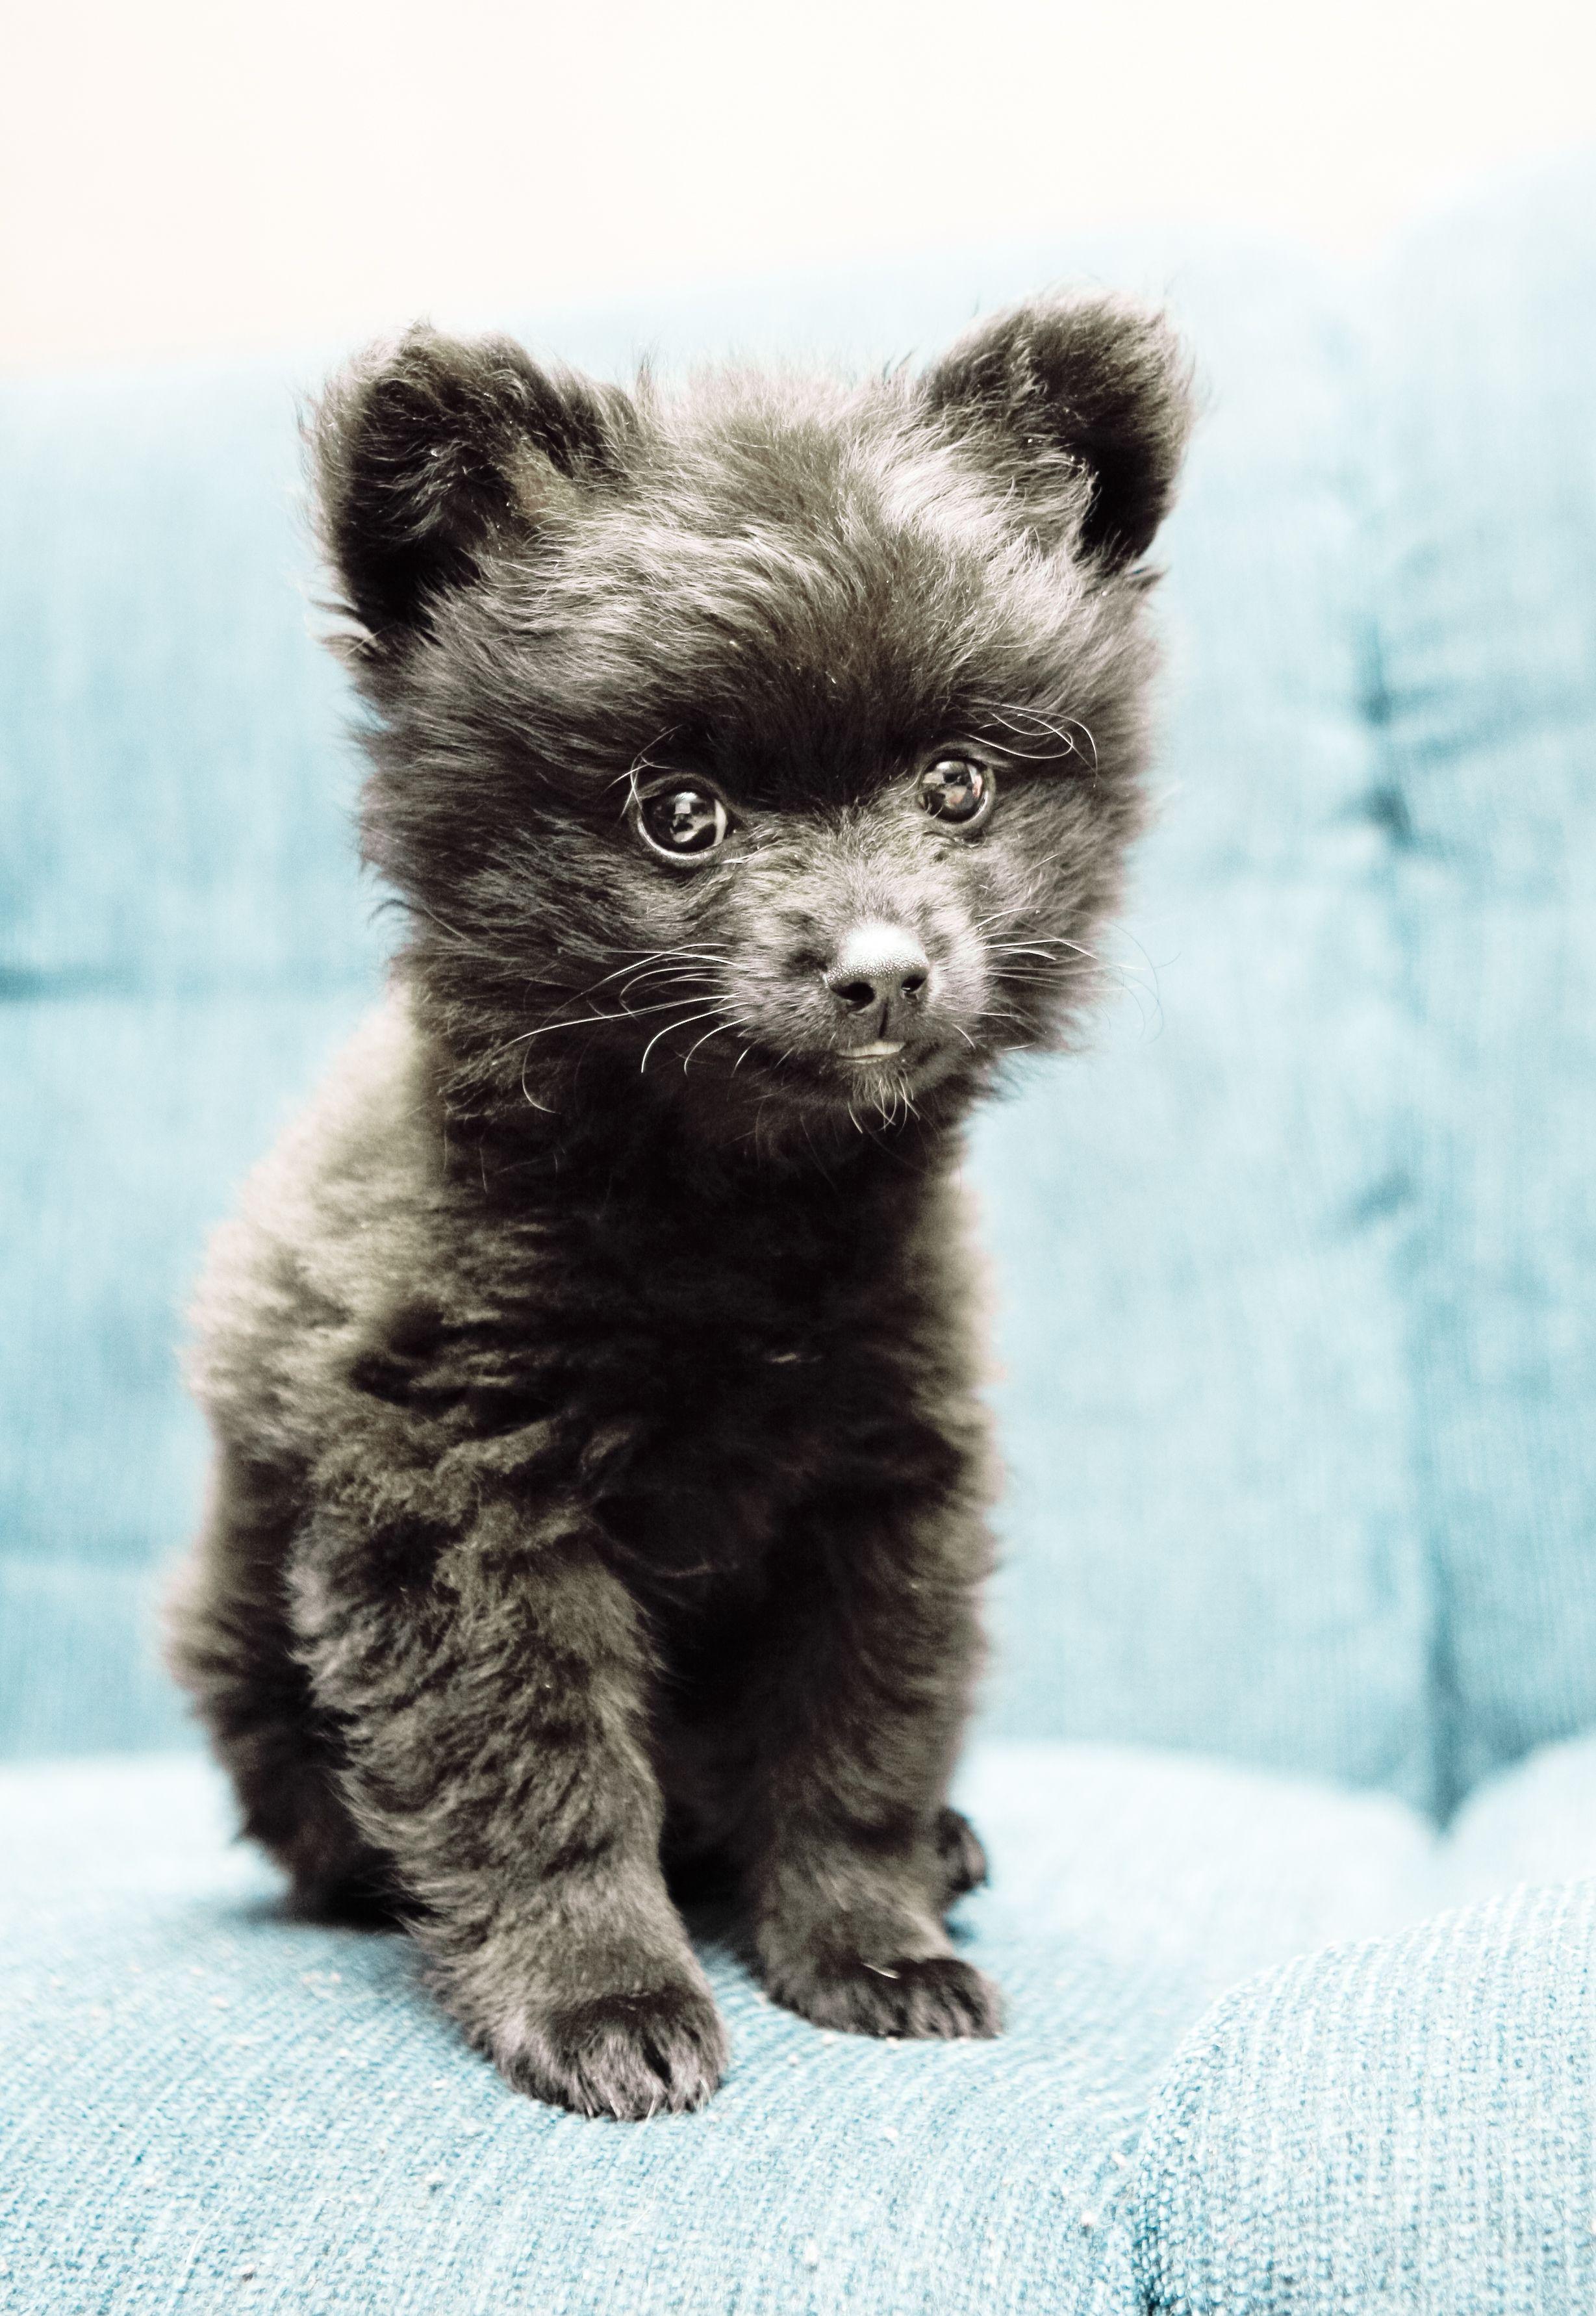 Download Koala Bear Chubby Adorable Dog - 6606b007c89d8a182ec7084d854f04f8  Gallery_4379  .jpg